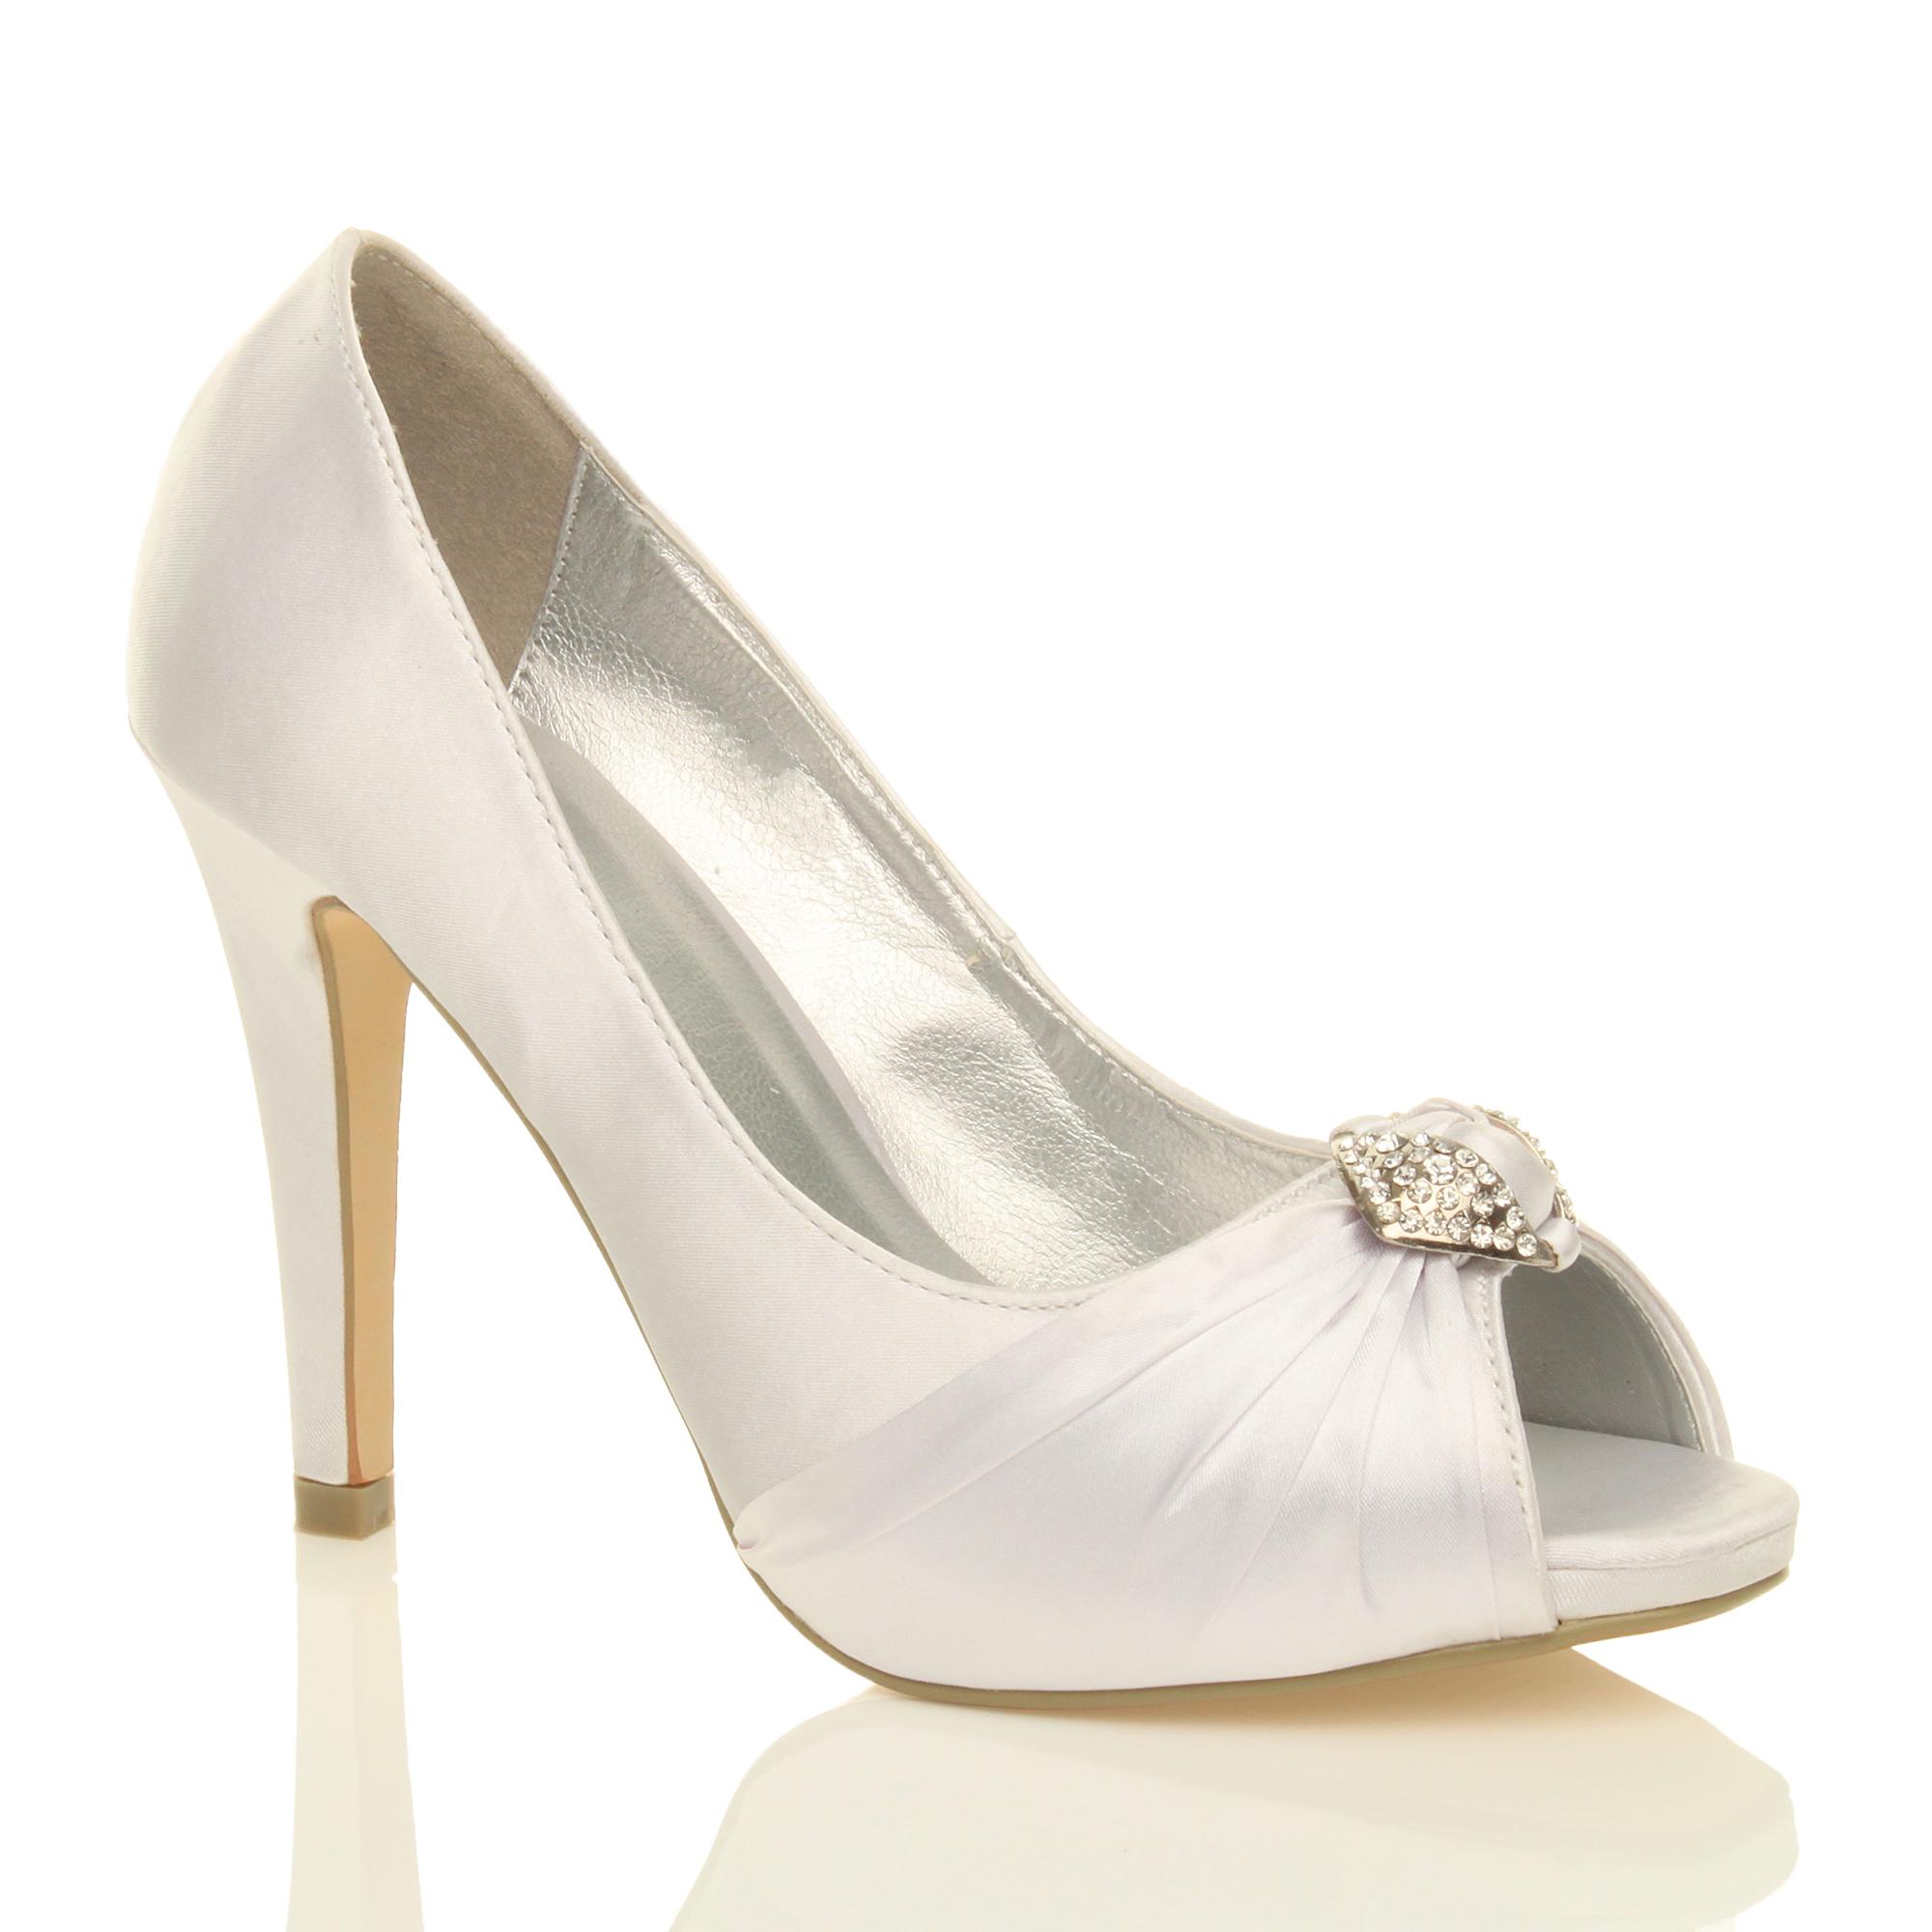 womens high heel prom bridal wedding peep toe court